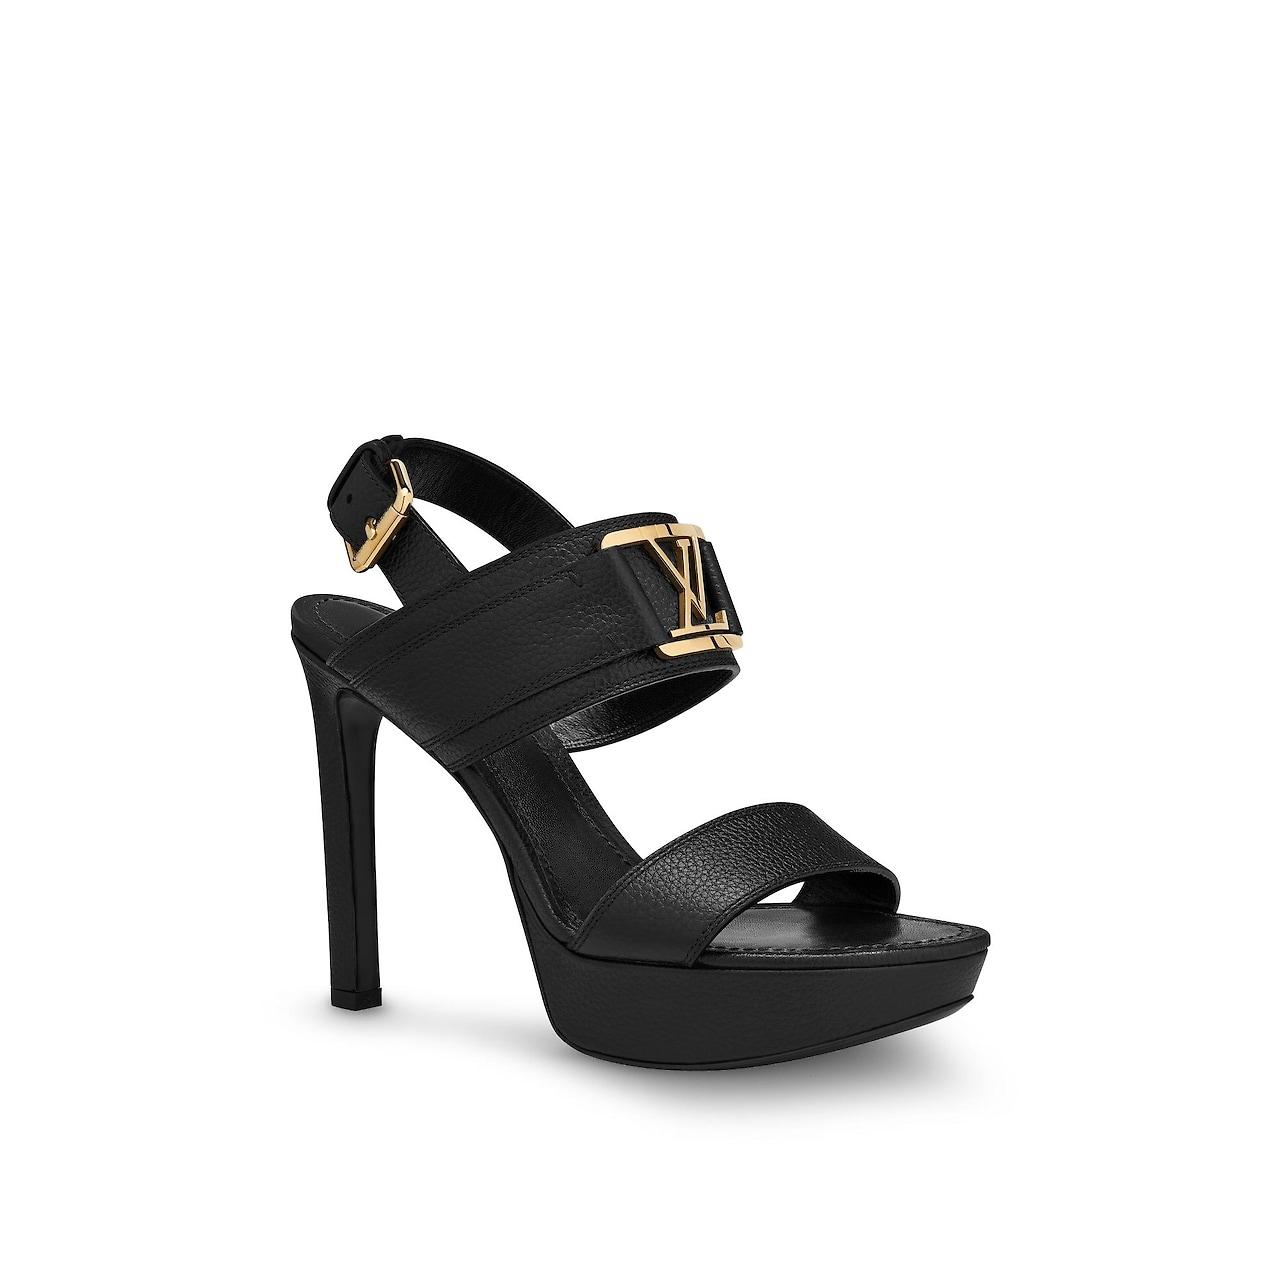 Tendenze-scarpe-primavera-estate-2020-Plateau-Louis-Vouitton